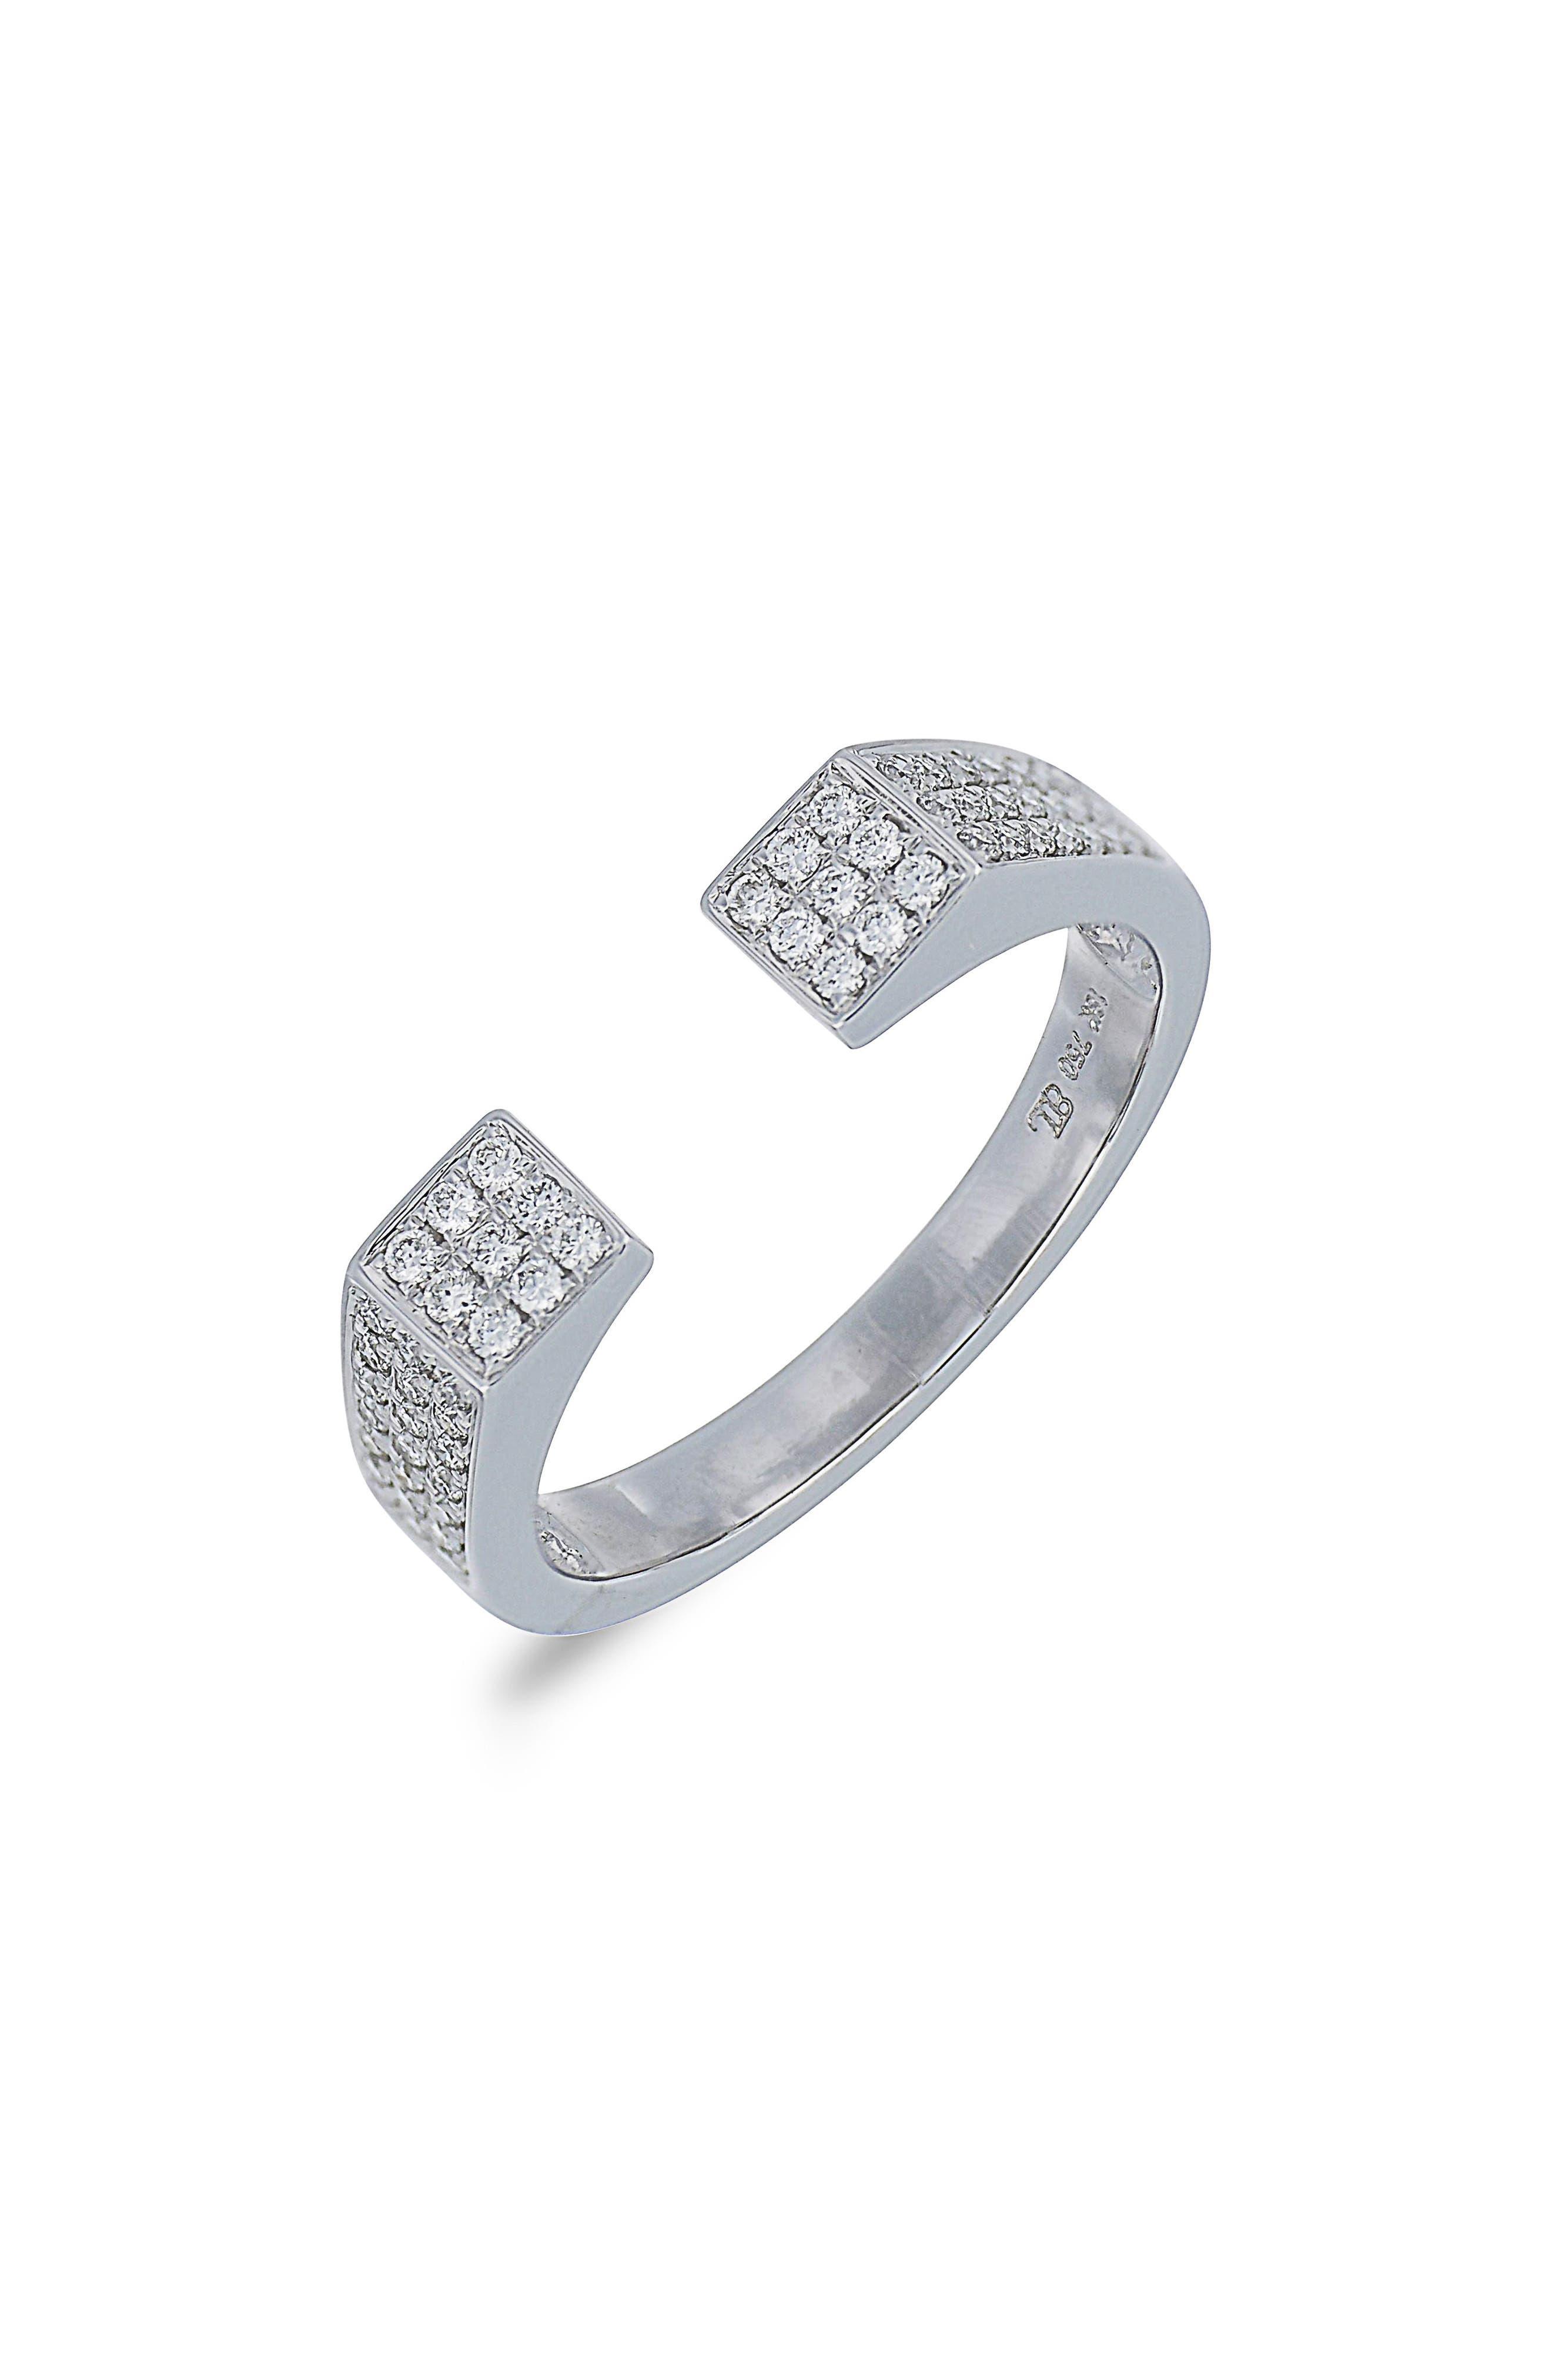 Openwork Diamond Ring,                         Main,                         color, White Gold